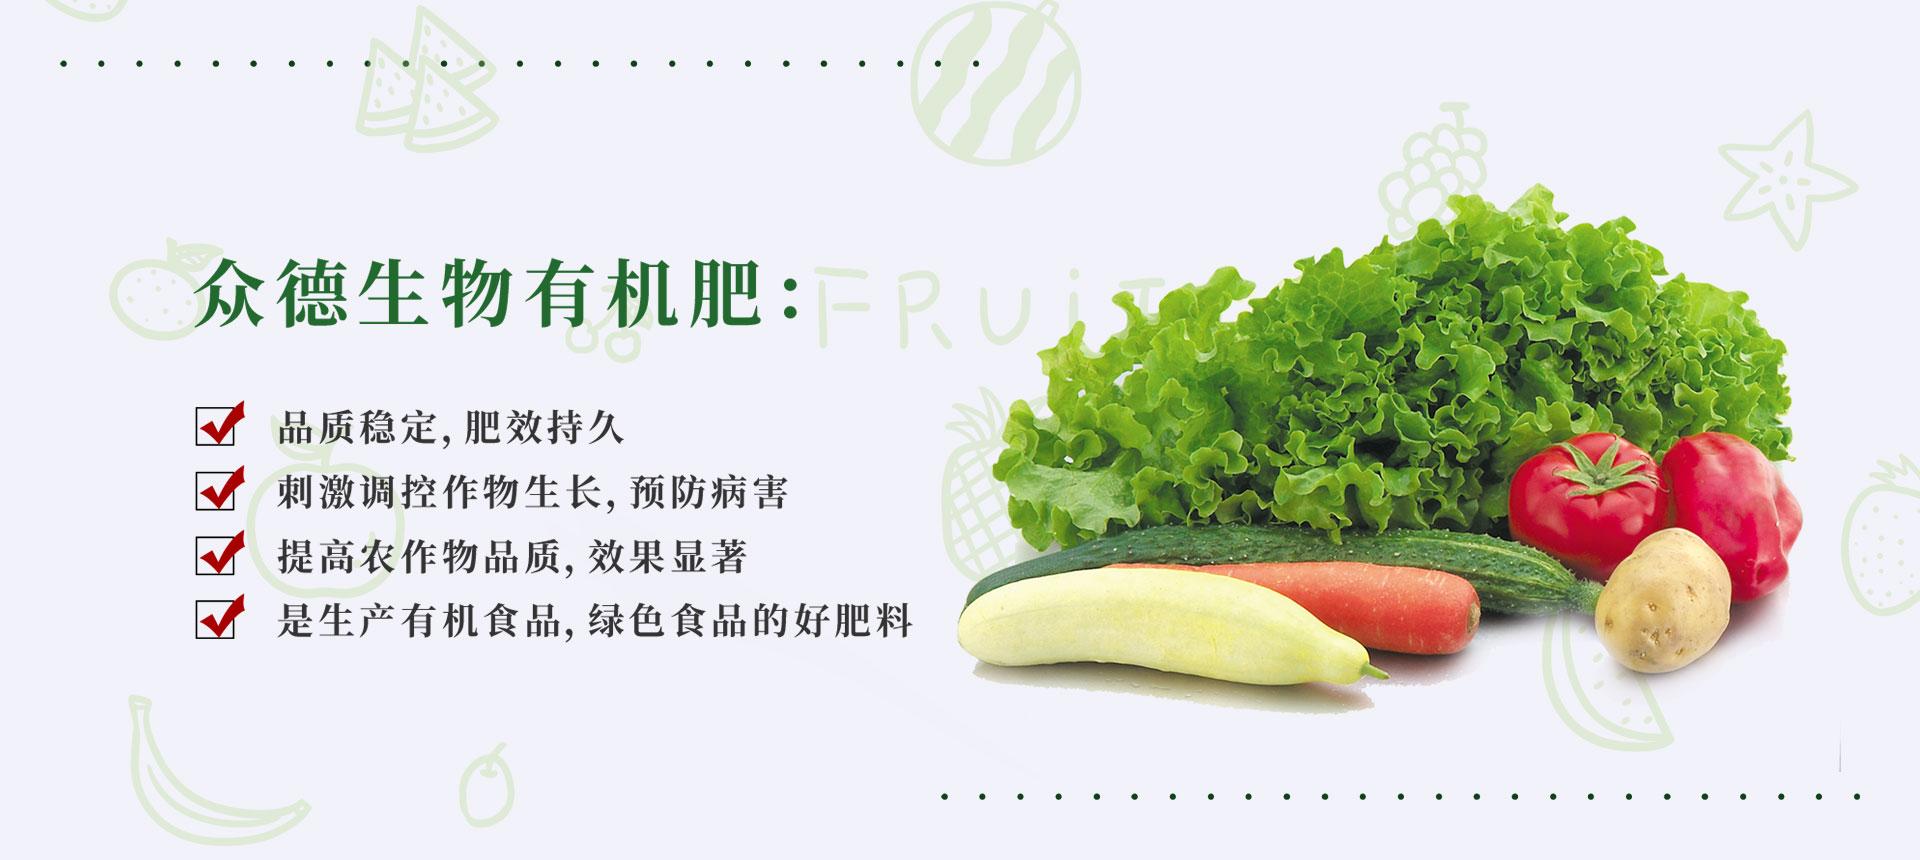 http://upload.ruituoyun.com/Upload/website/18/image/2019/11/12/6370916968550498271161066.jpg